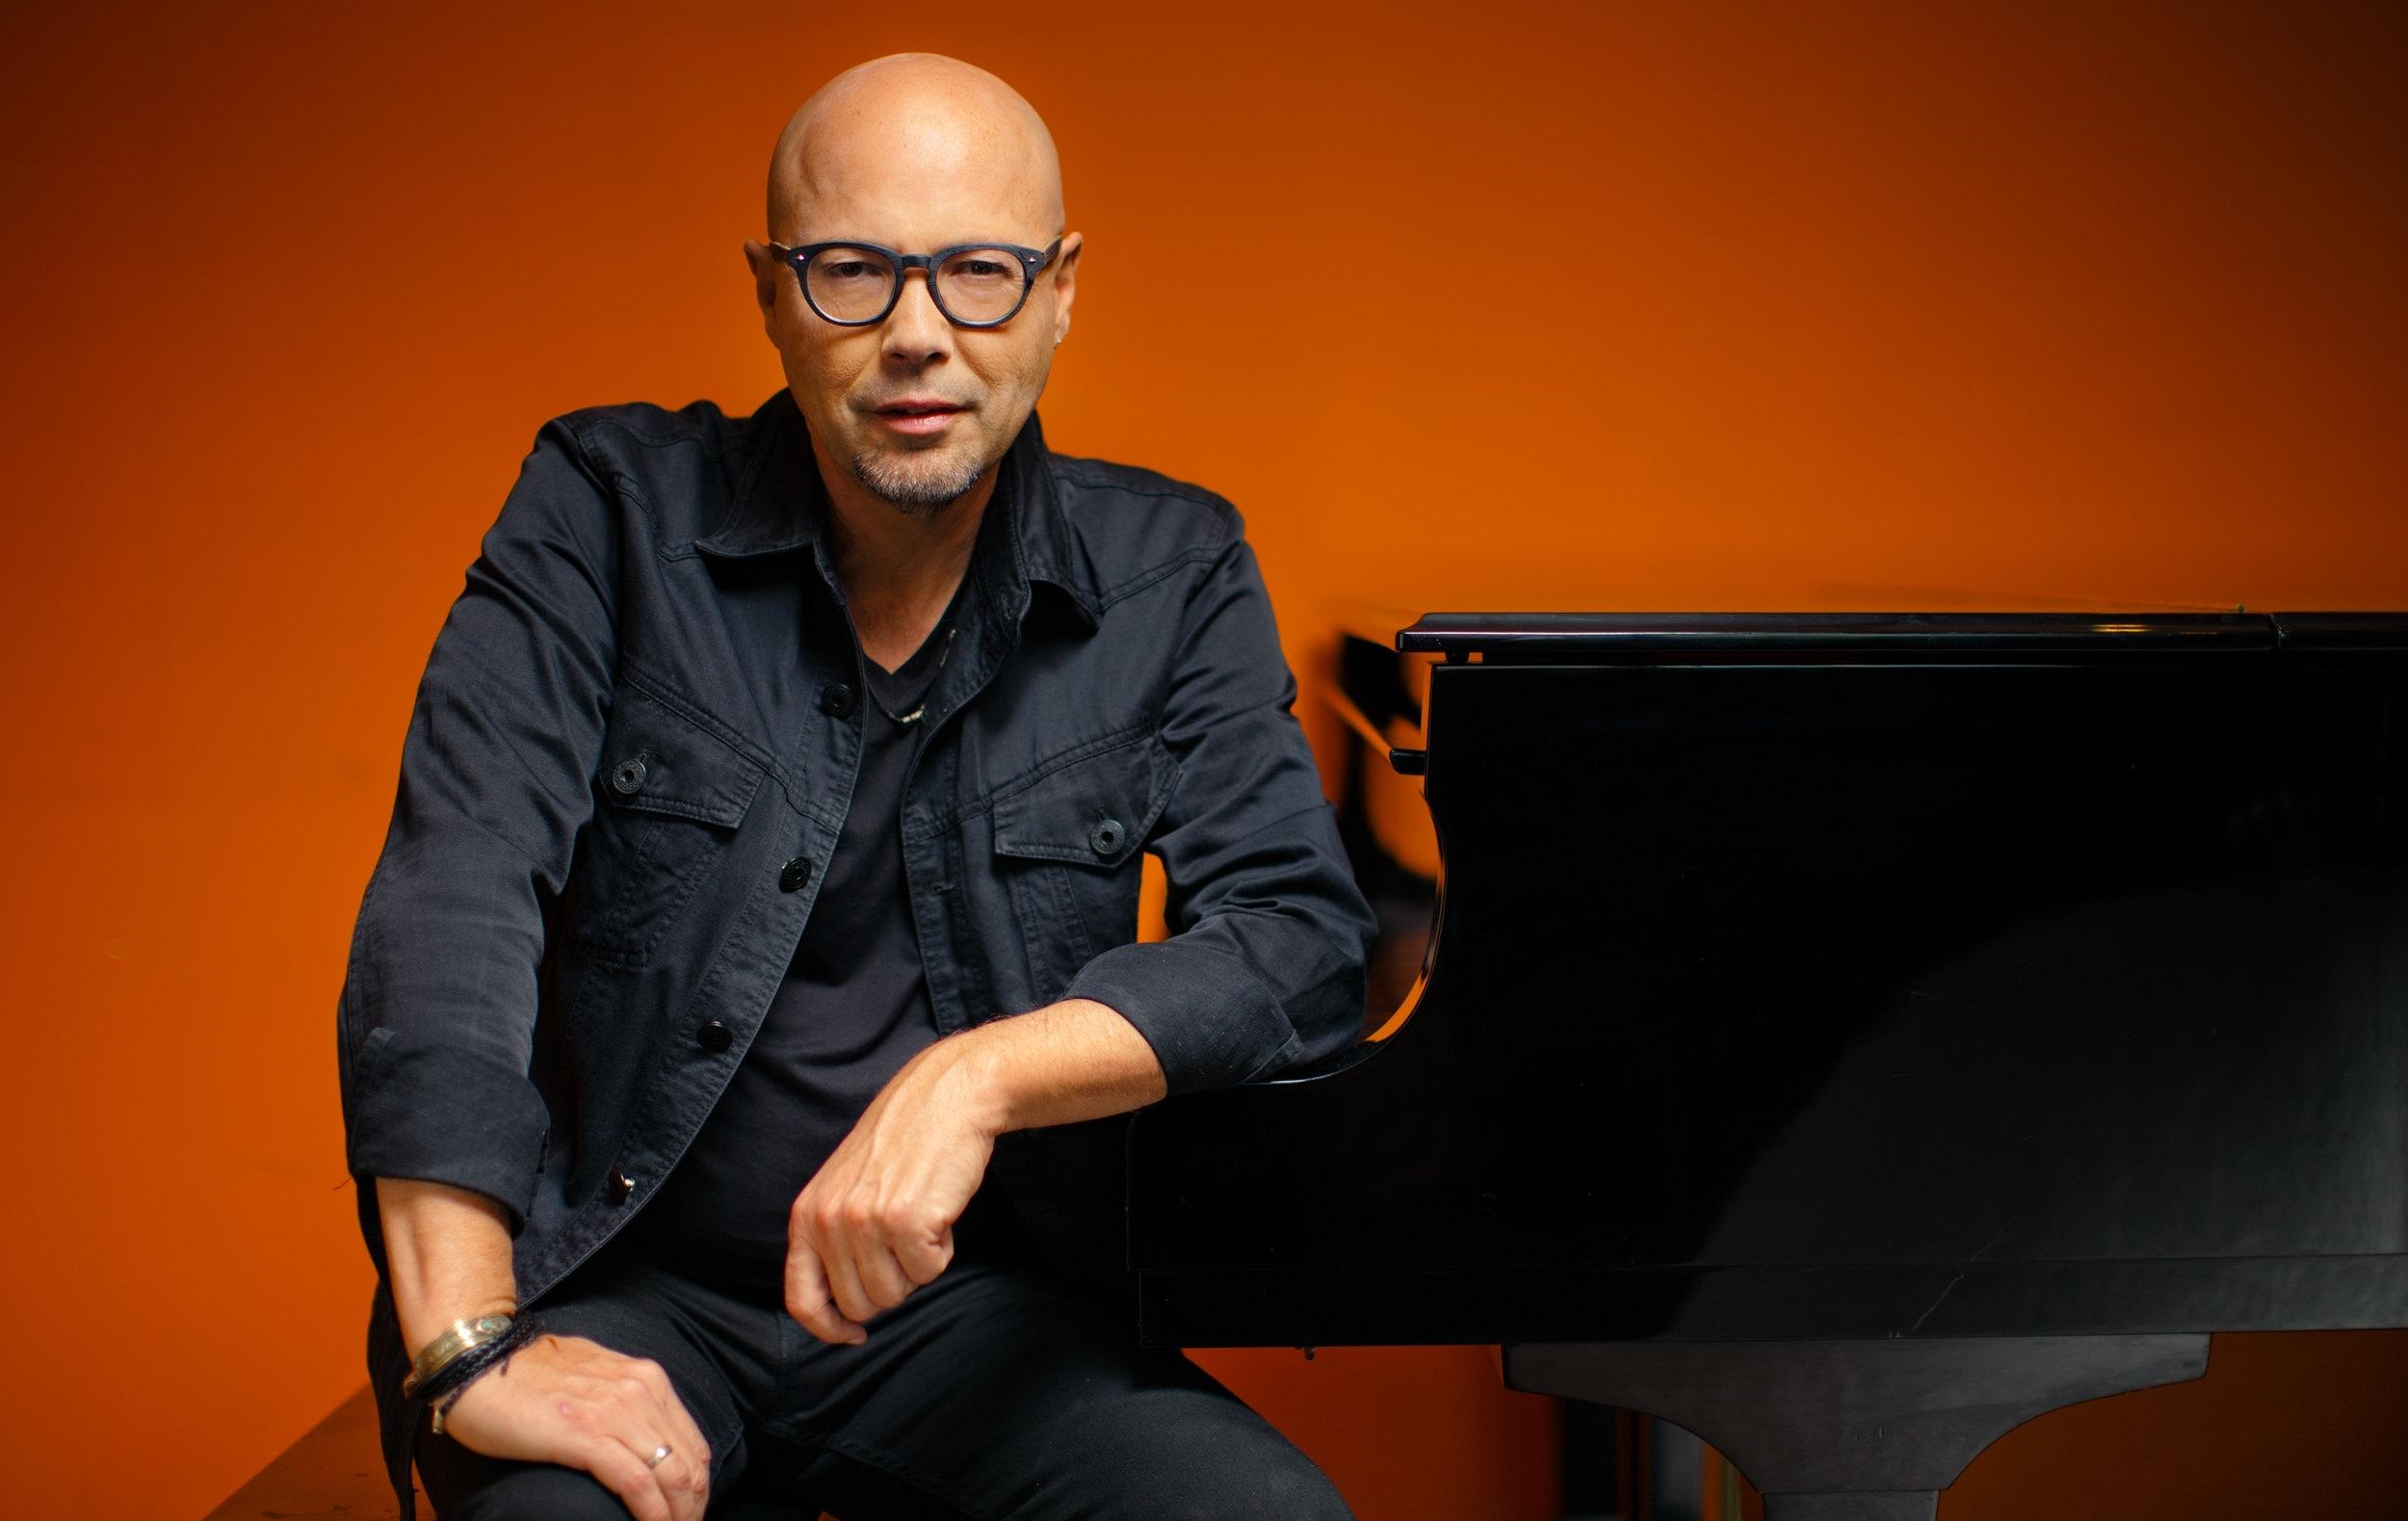 John Beasley, jazz piano/director